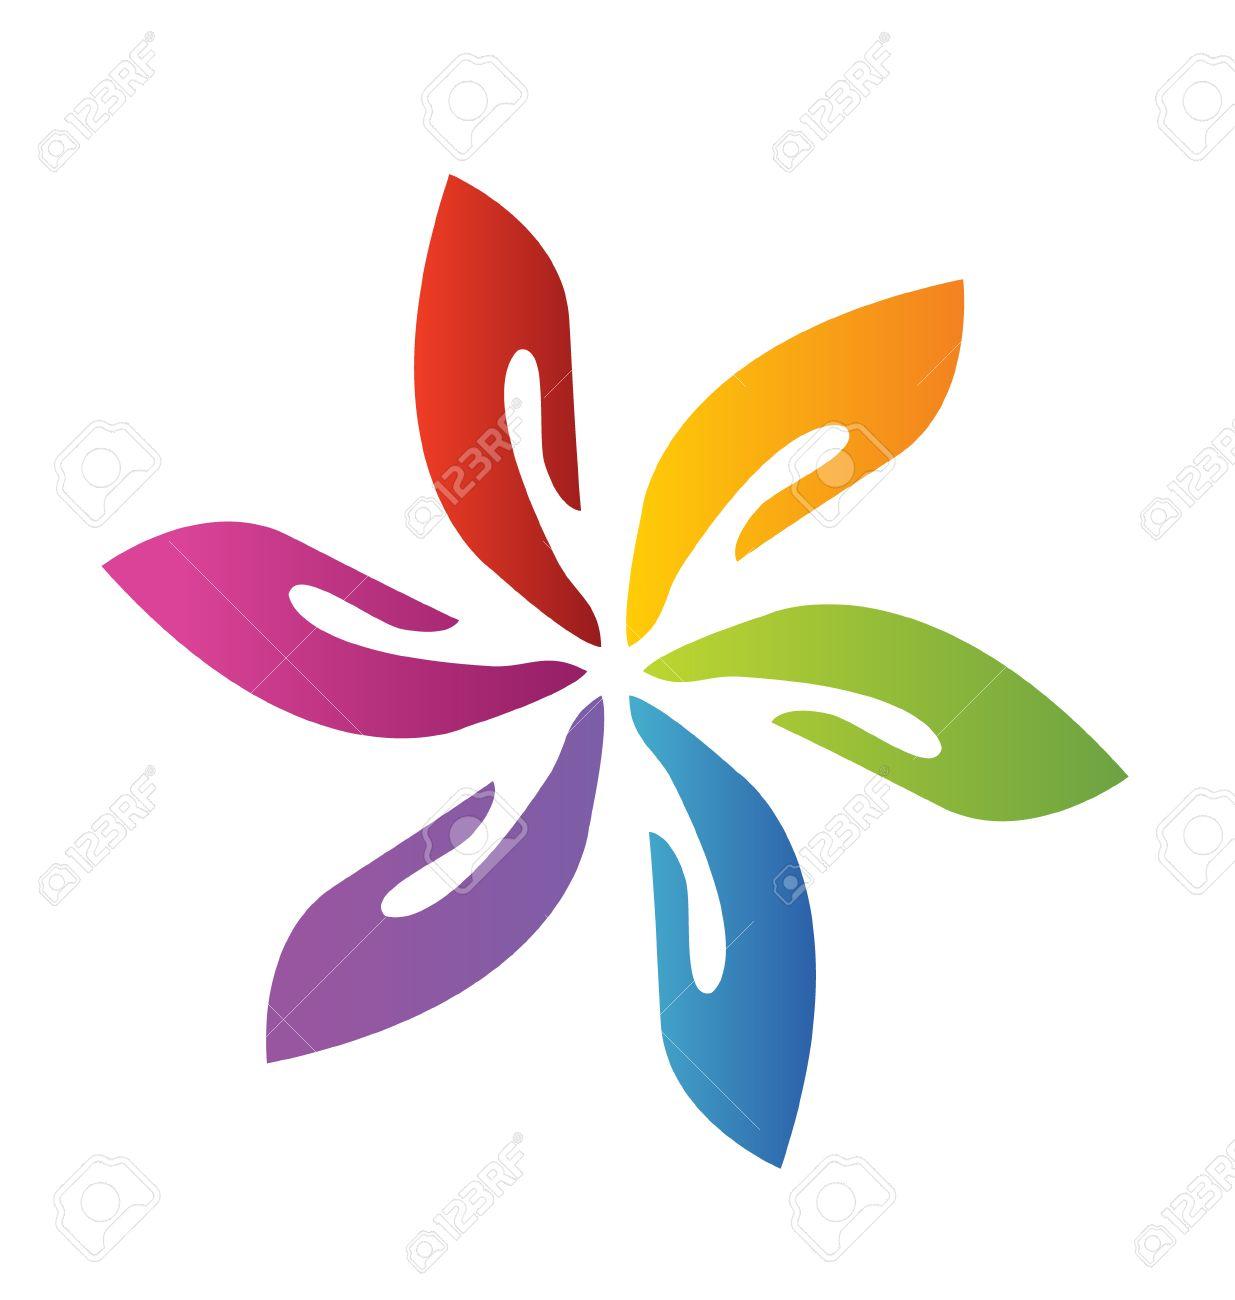 Hands teamwork flower icon vector Stock Vector - 23192285